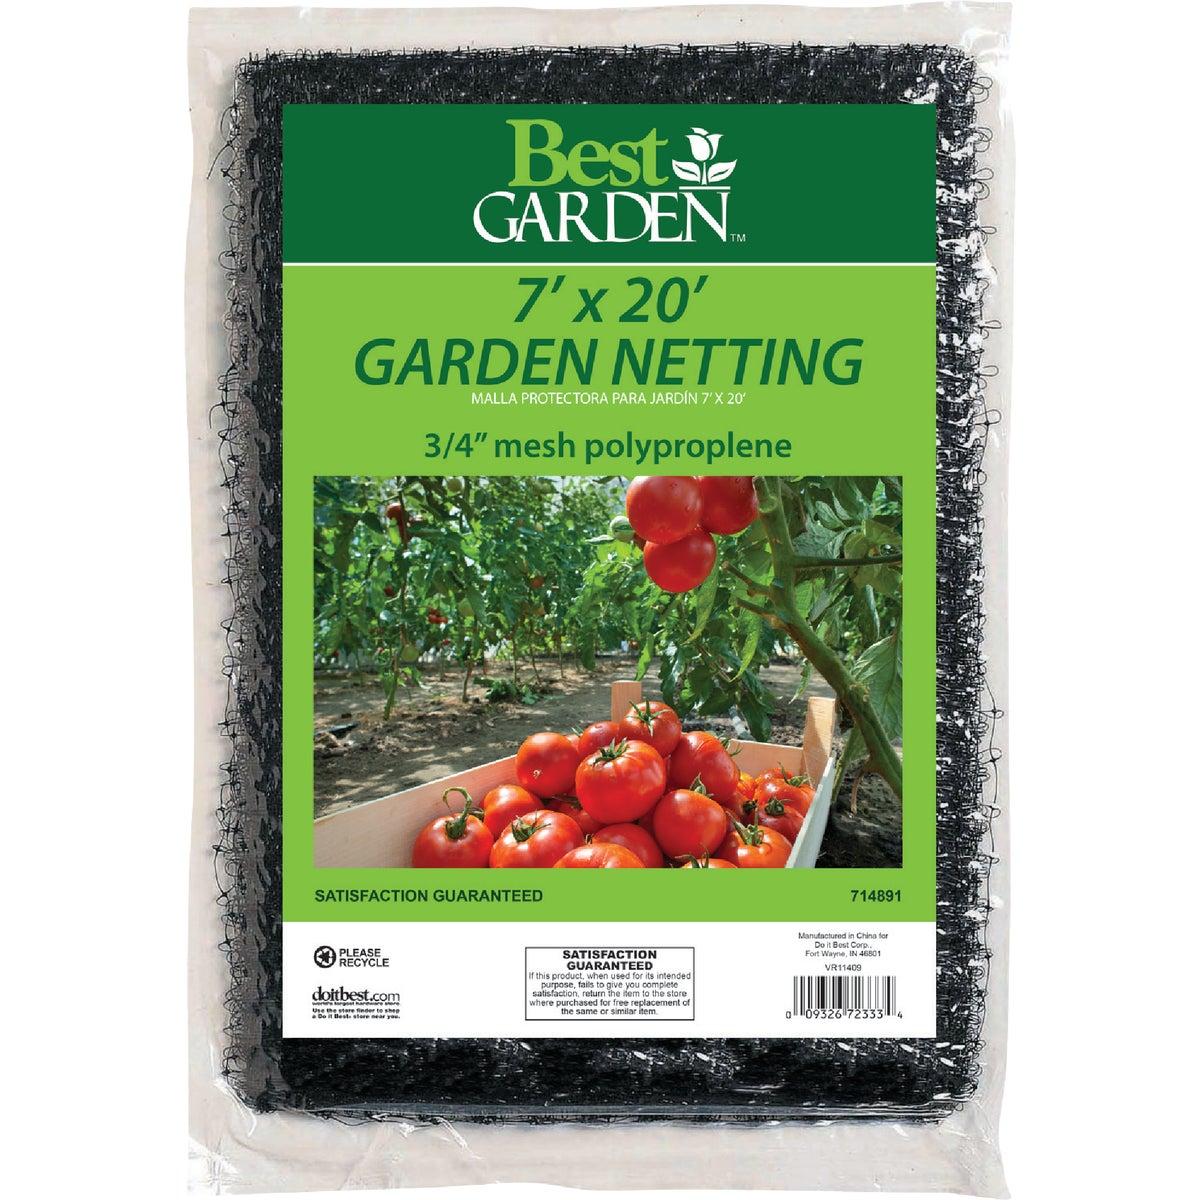 7X20 GARDEN NETTING